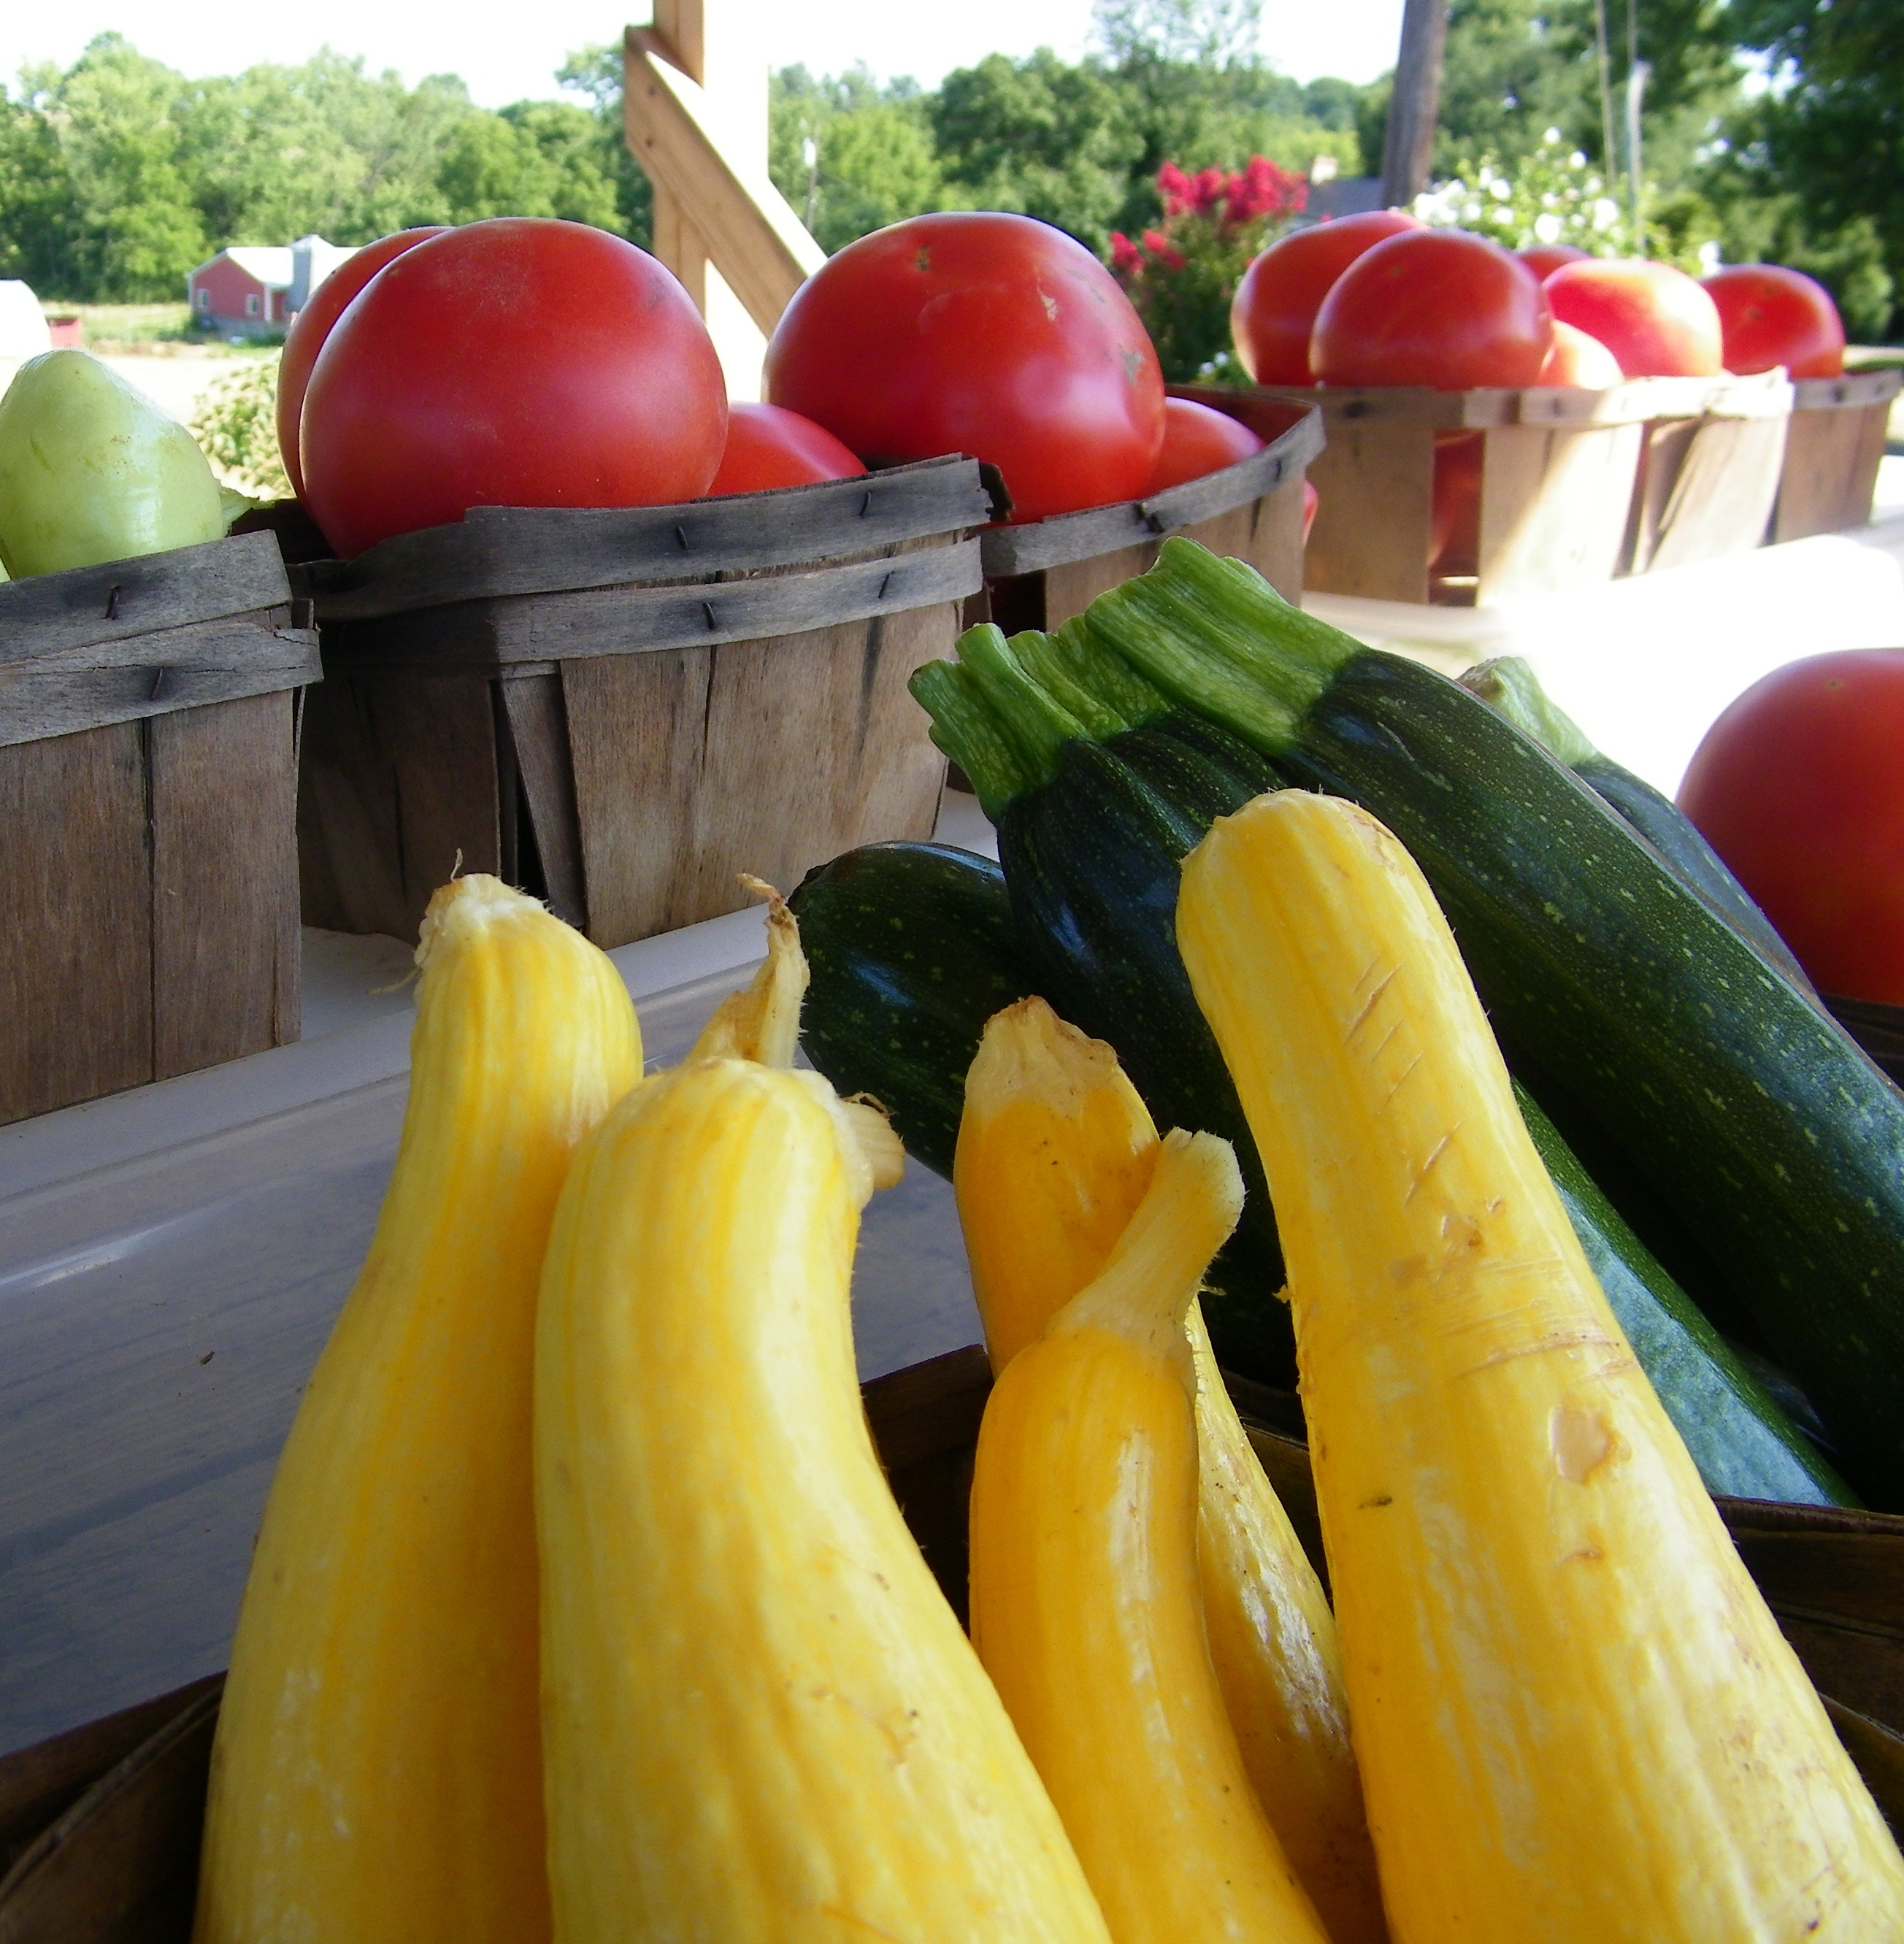 Vegetables, farmers market, organic food, agriculture farms, fruit and vegetable, farm markets, food distributors, food suppliers, wholesale food, farm produce, produce vegetables